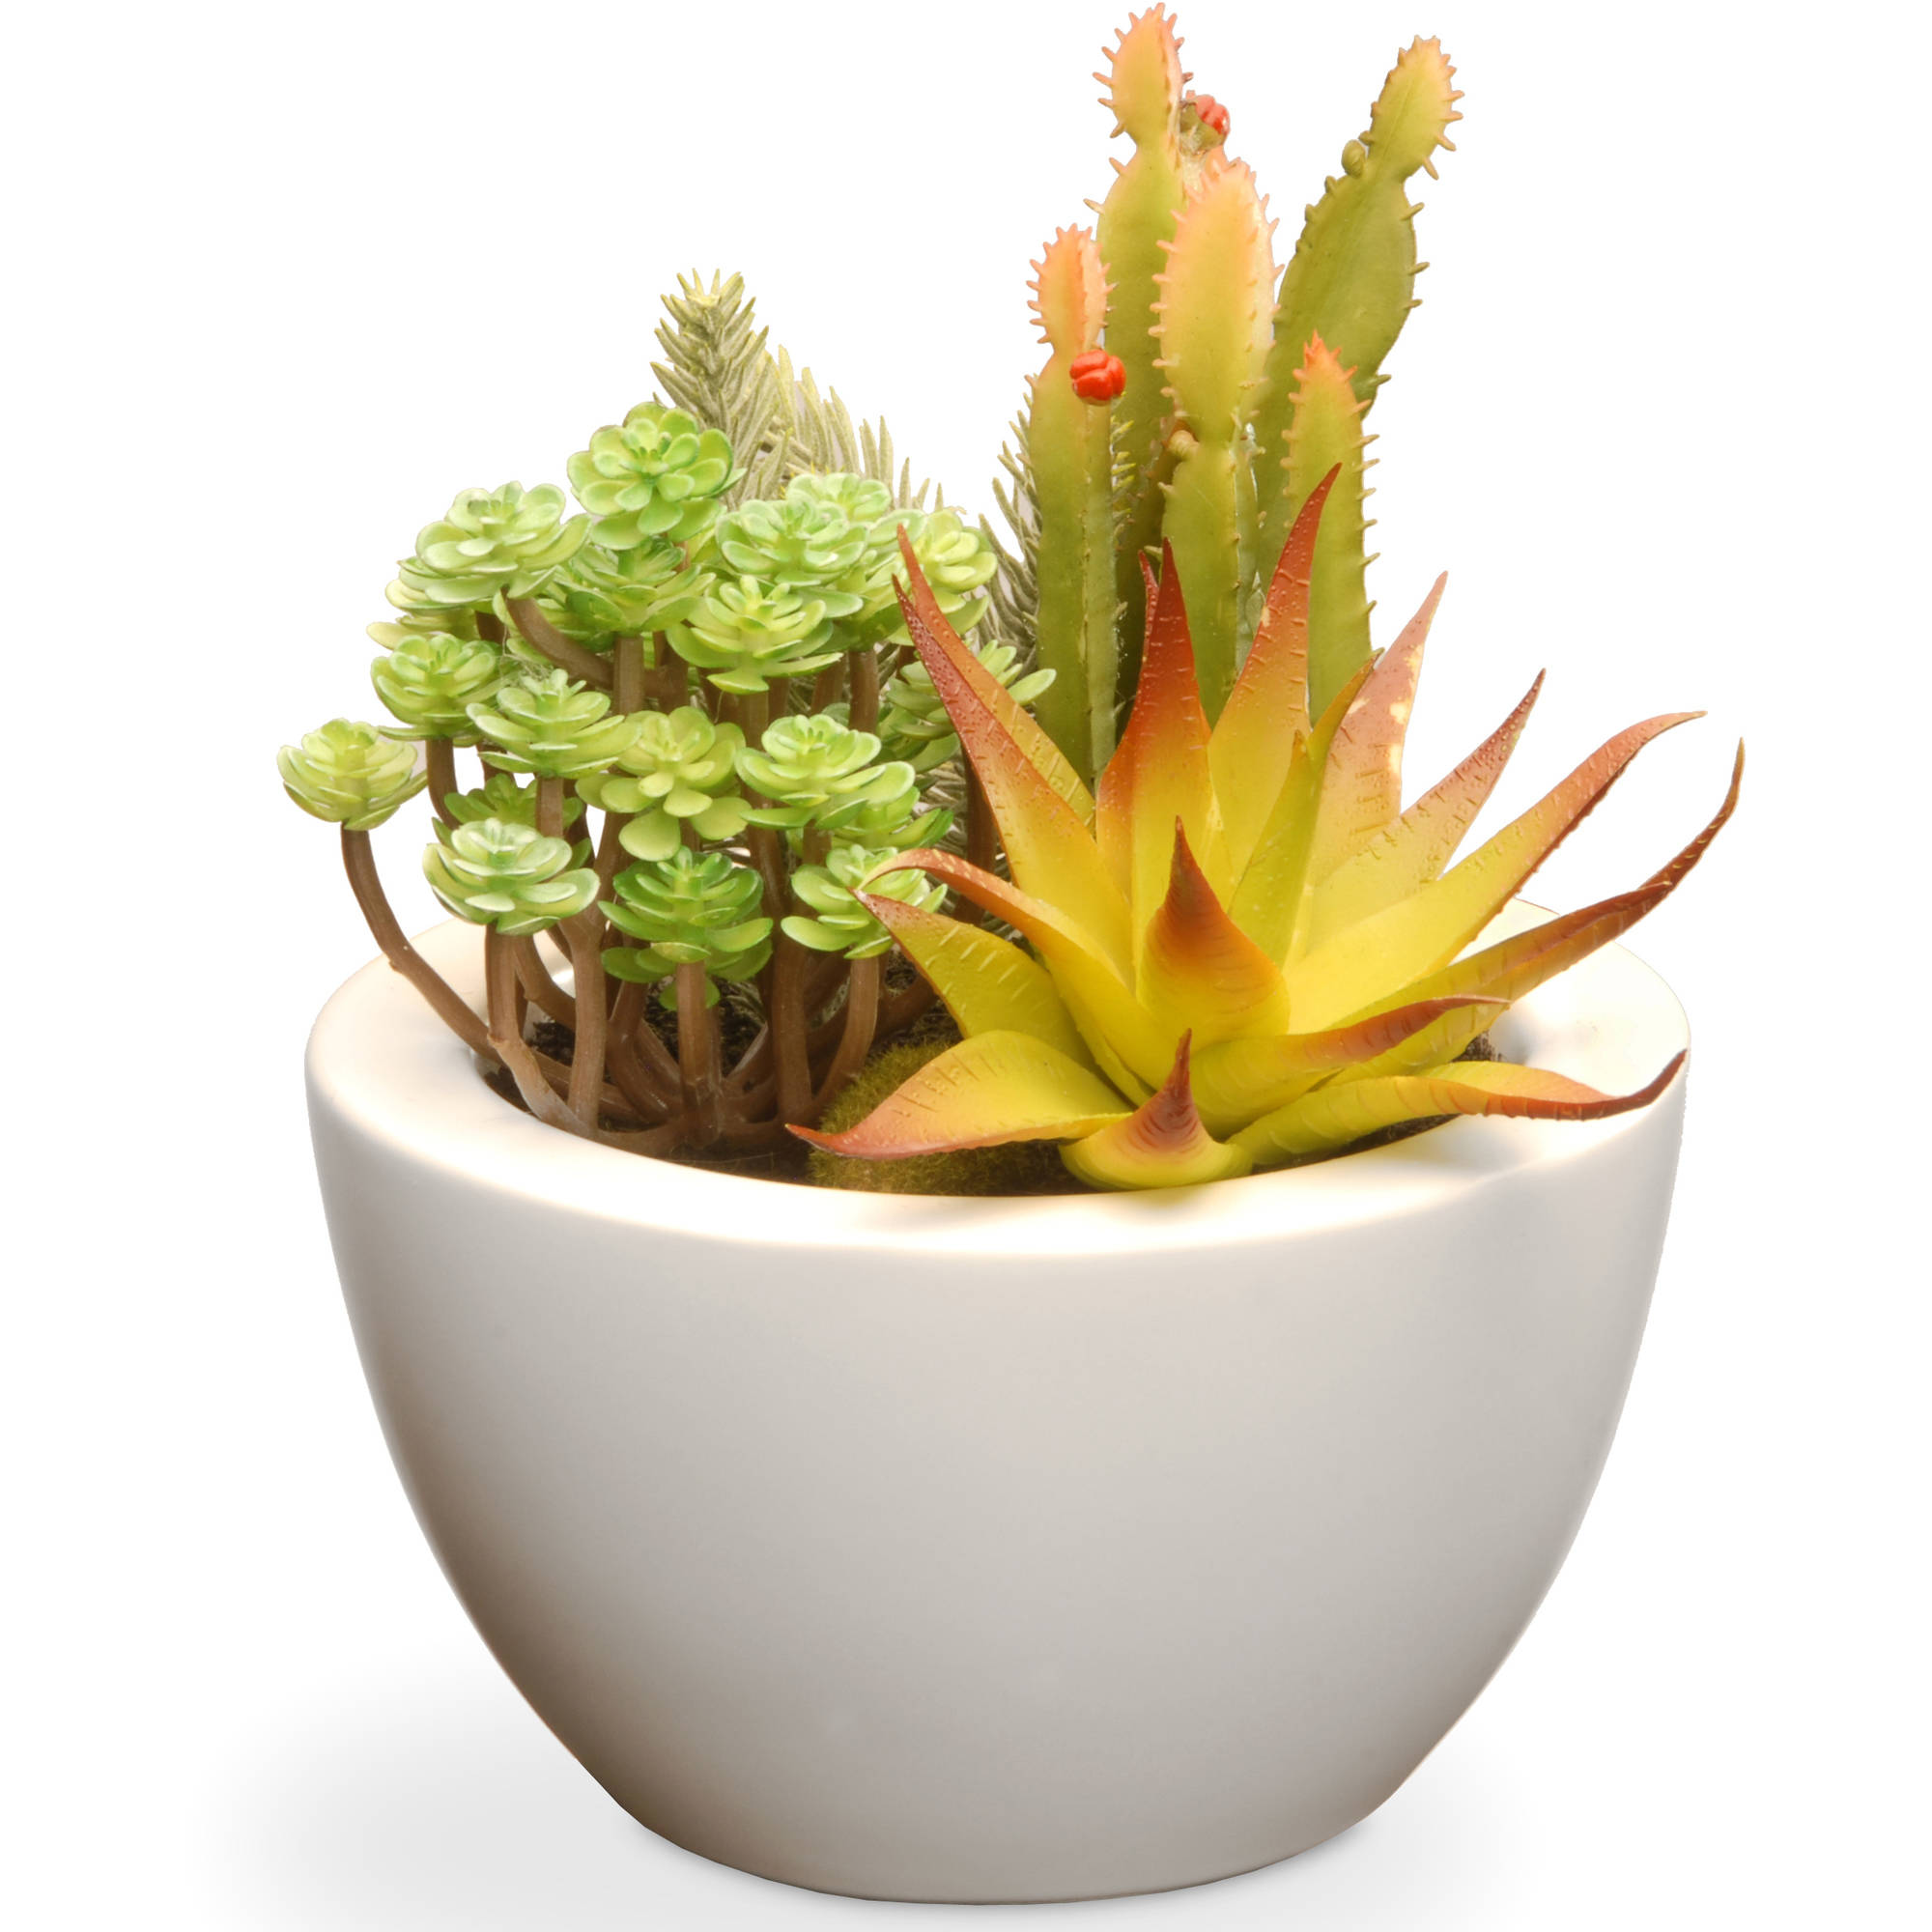 National Tree RAS-XF119W 9.8 in. Succulent in Ceramic Pot